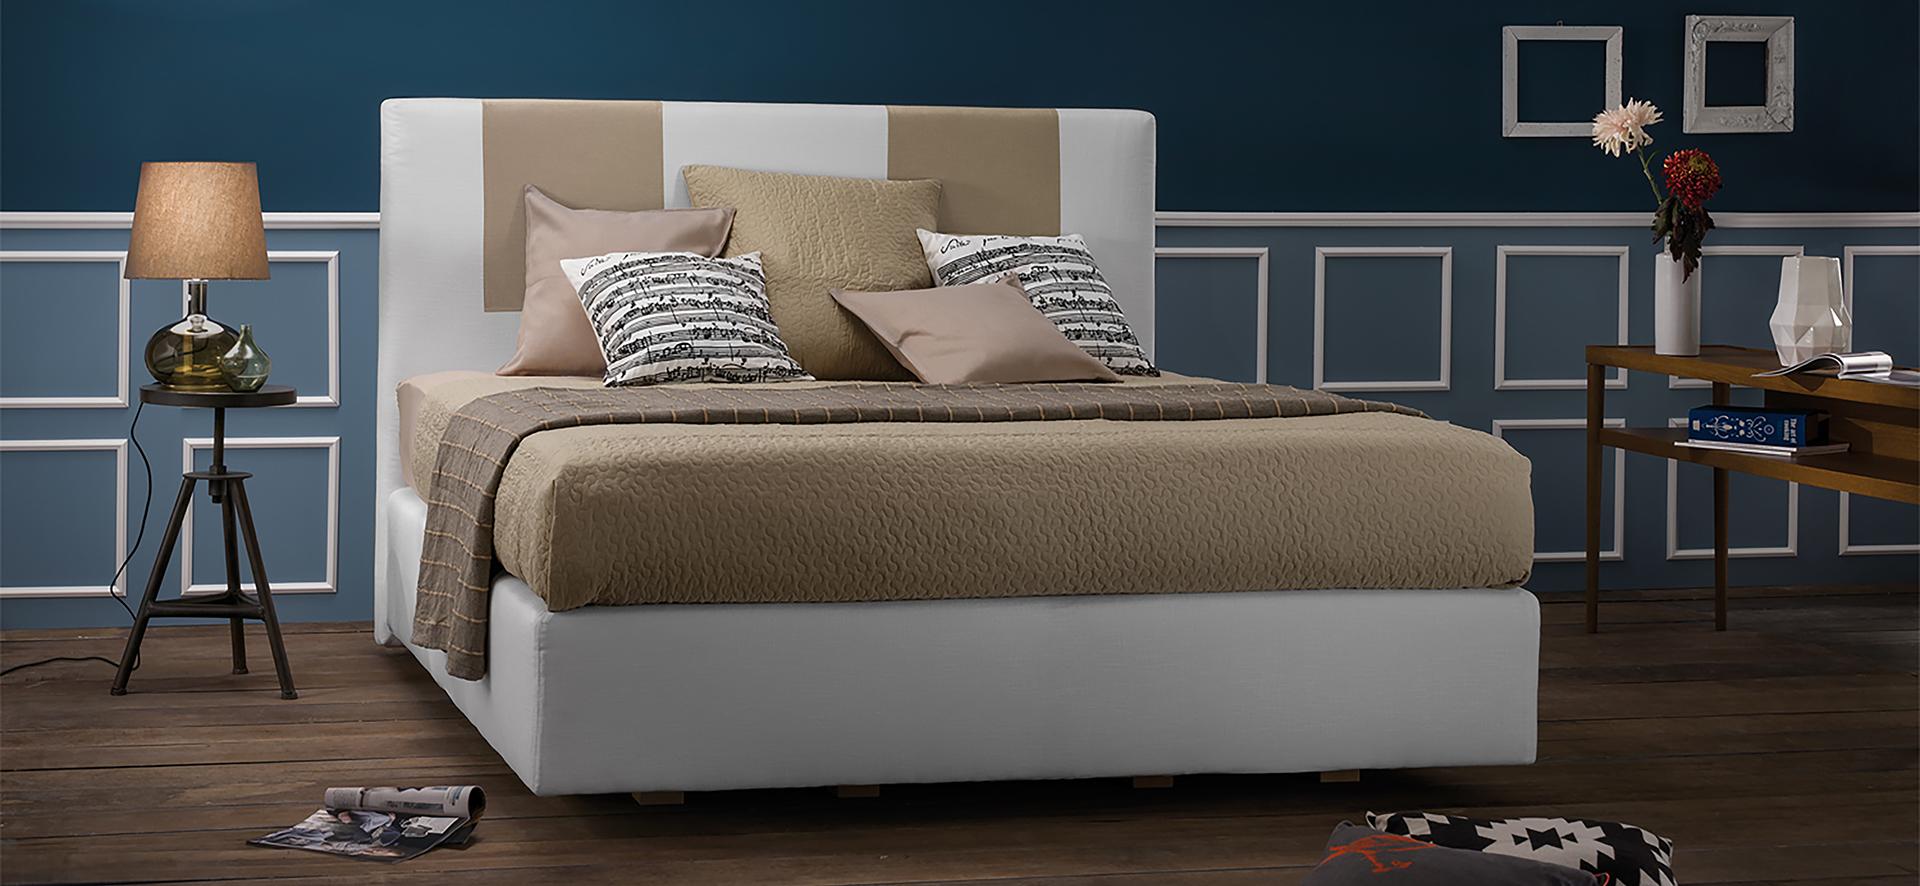 natur boxspringbett vega in frankfurt main dormivital. Black Bedroom Furniture Sets. Home Design Ideas